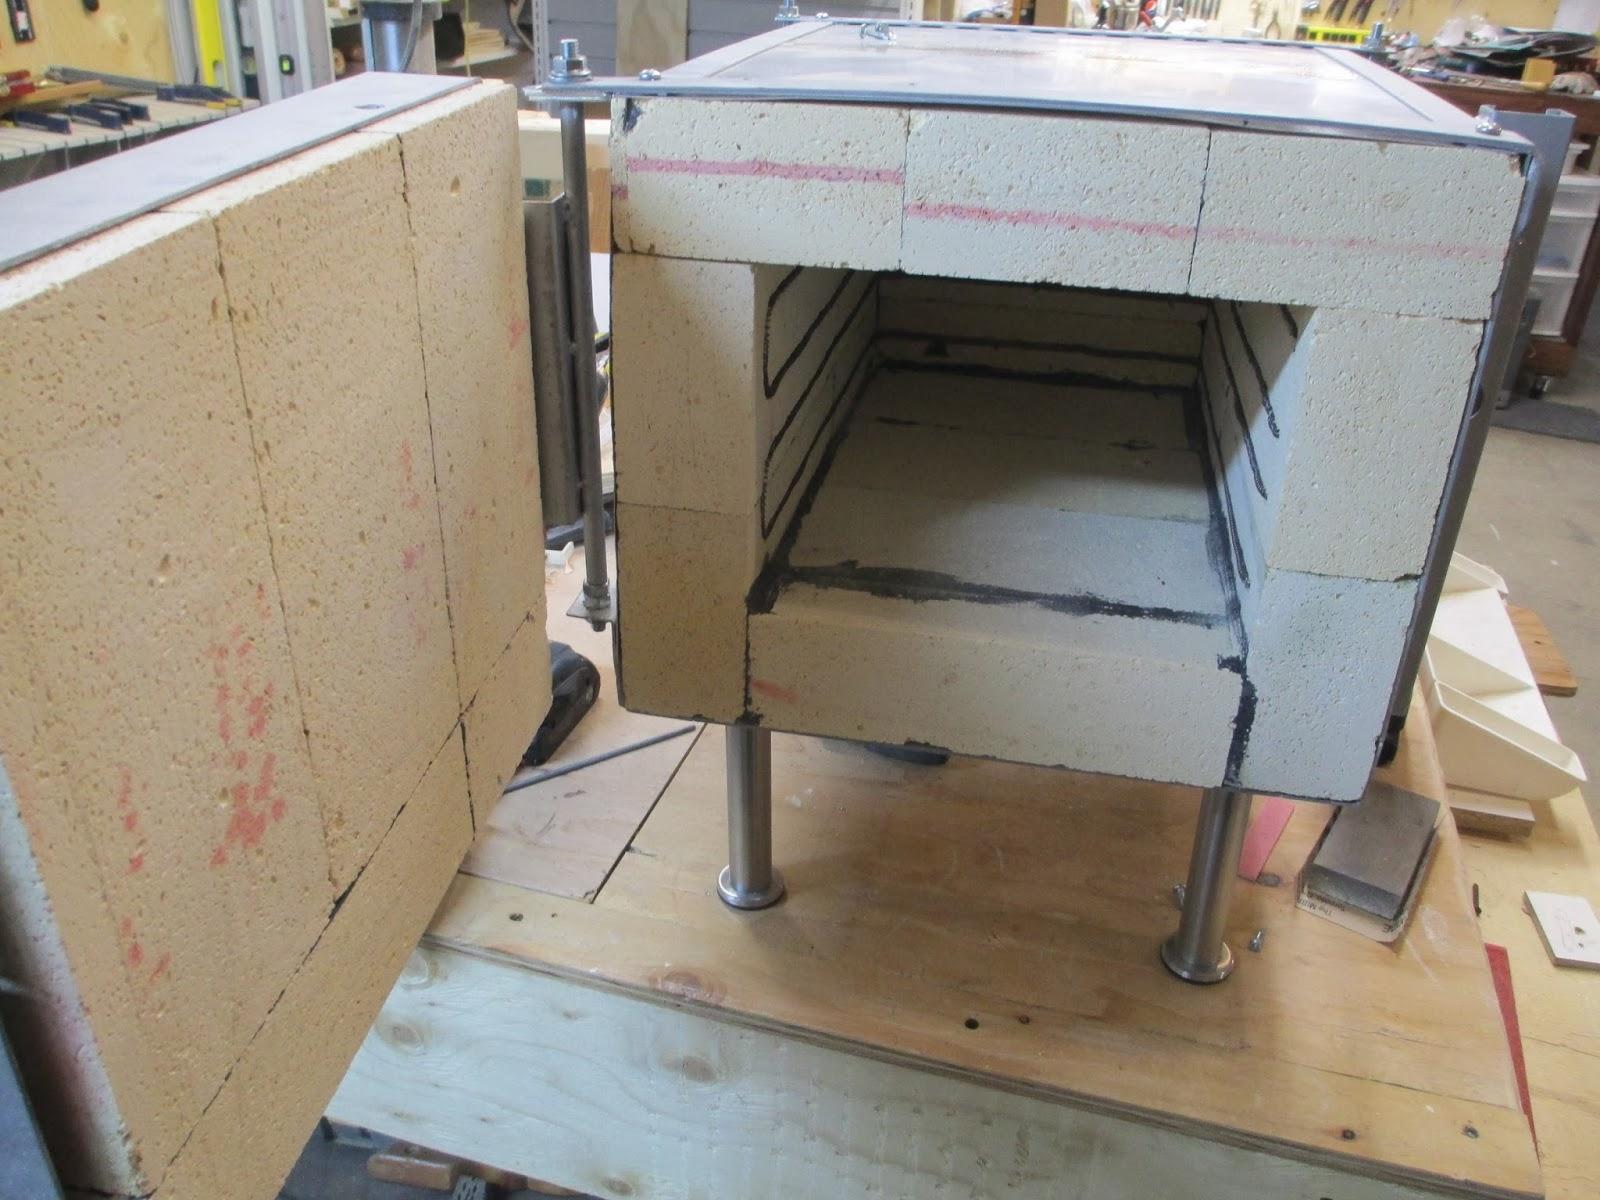 Knife Forging Ovens : Diy knifemaker s info center heat treatment oven project